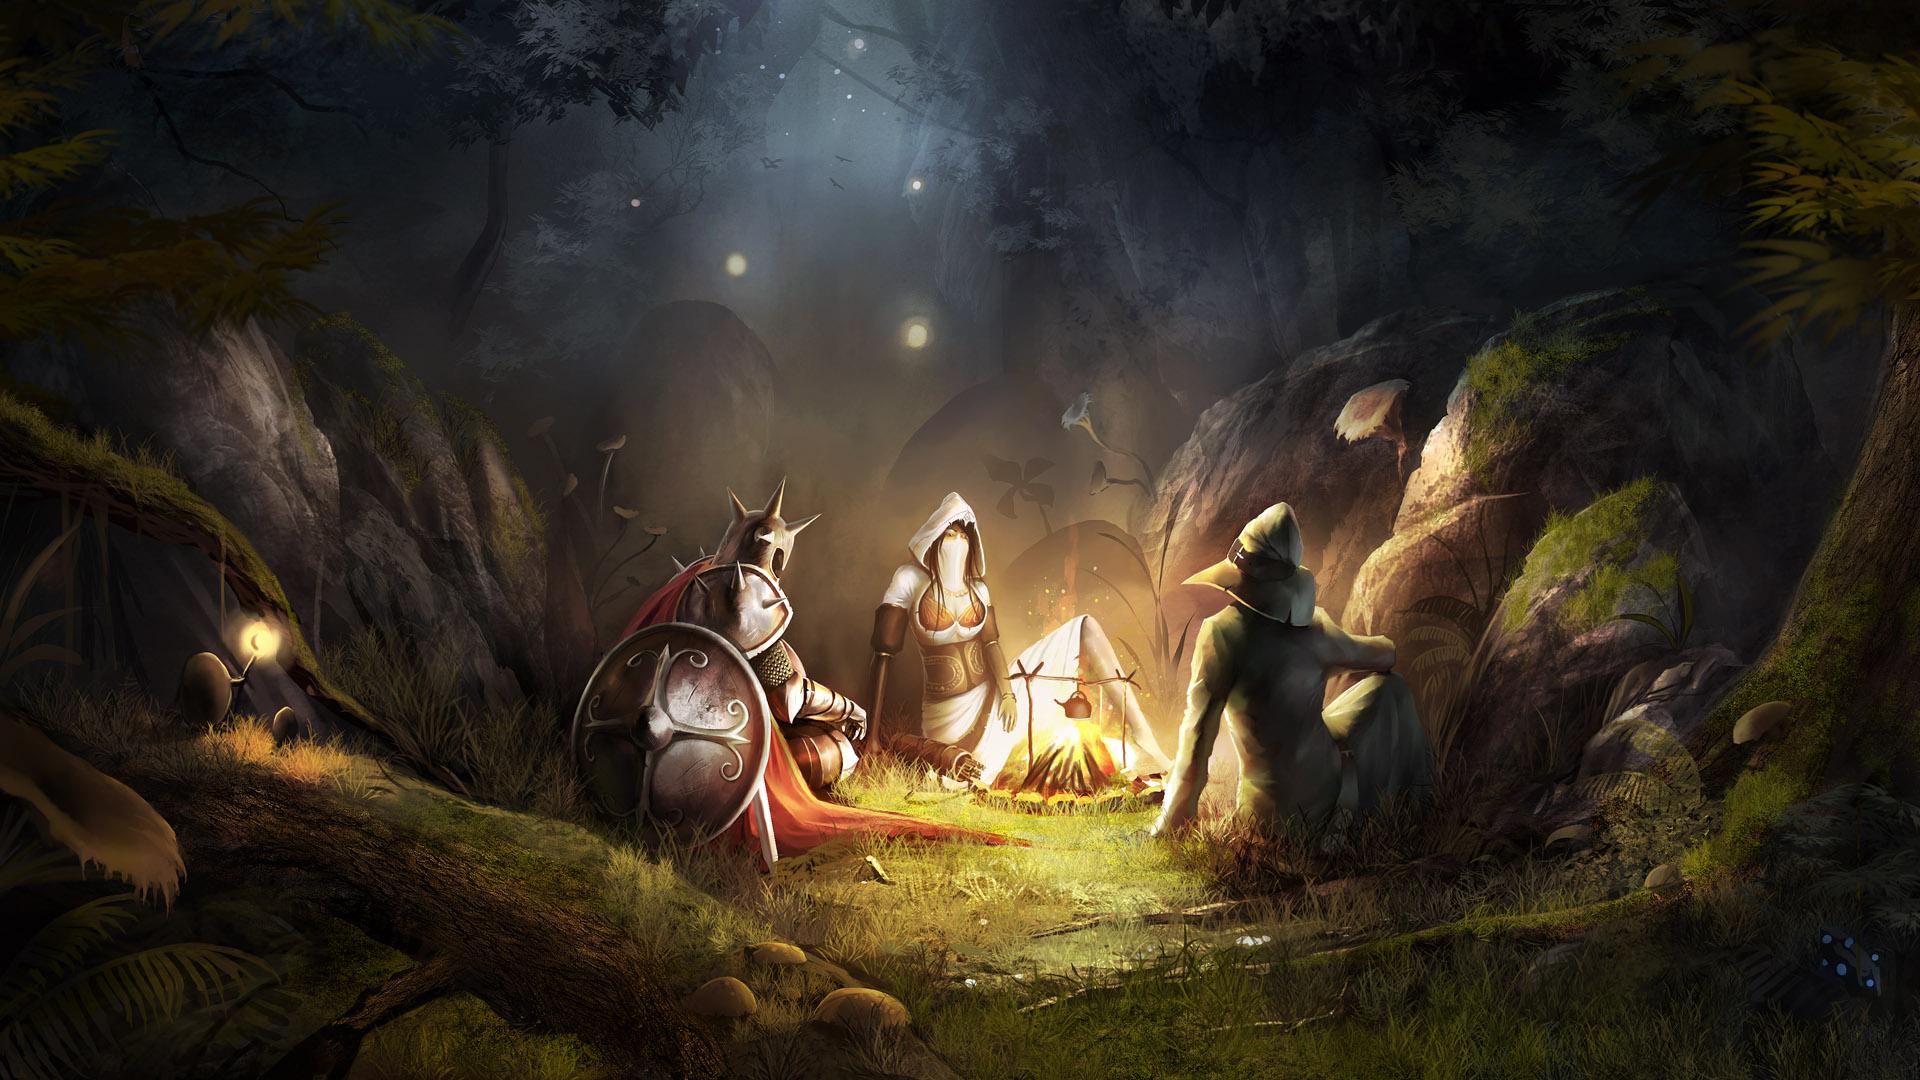 Dungeons-Dragons-Fantasy-Girl-High-Quality-Wide-HD-Wallpaper-7nbt8-Free.jpeg